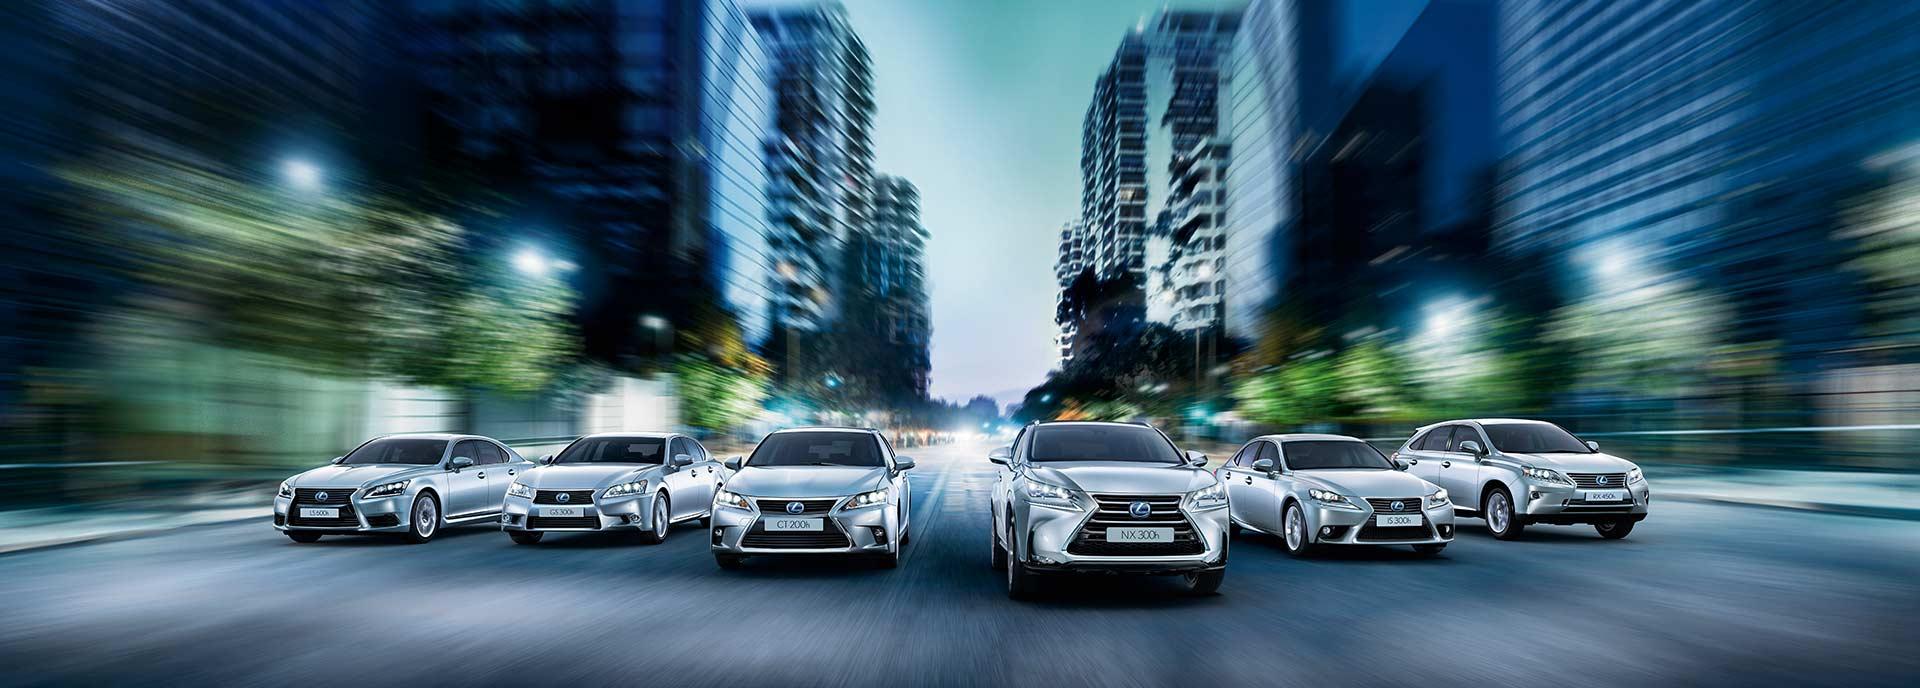 Lexus Businesspluss